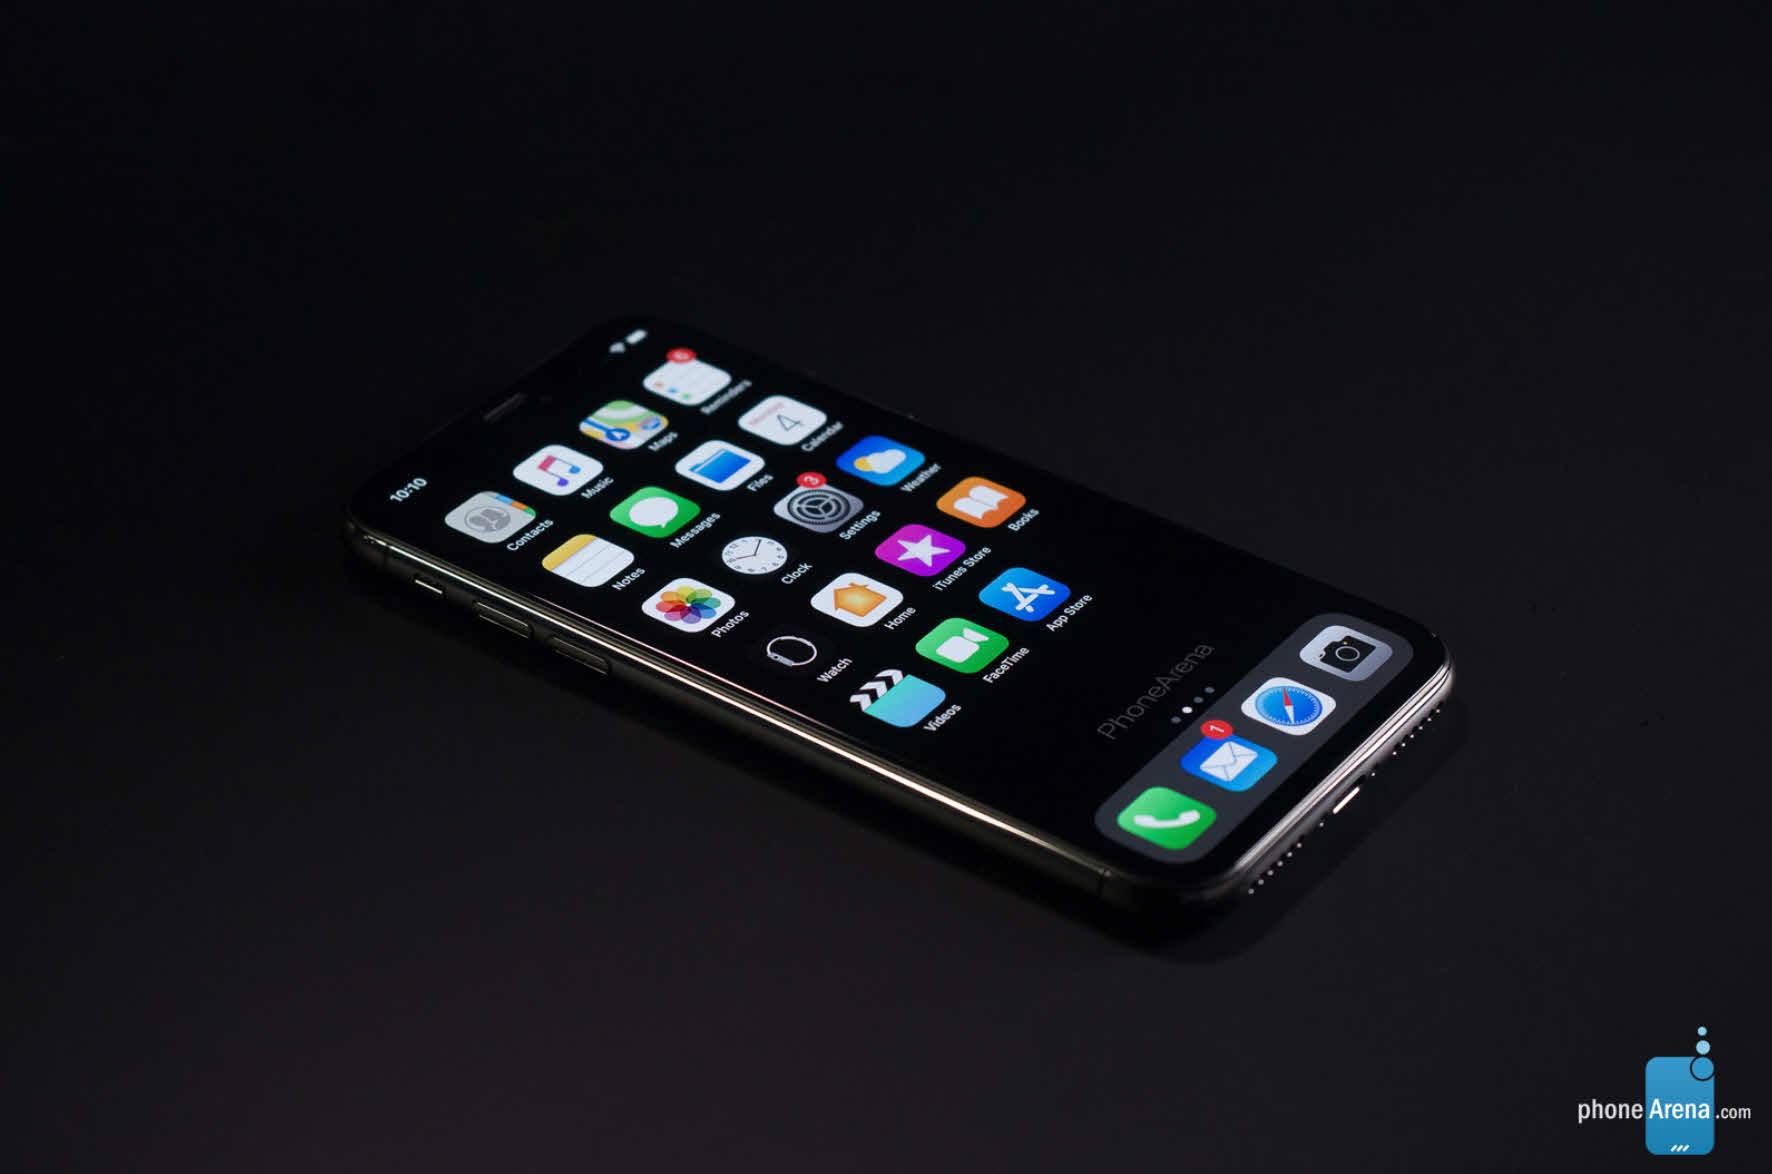 Phonearena Iphone Xi Ios 13 Darkmode Render Img 1 1